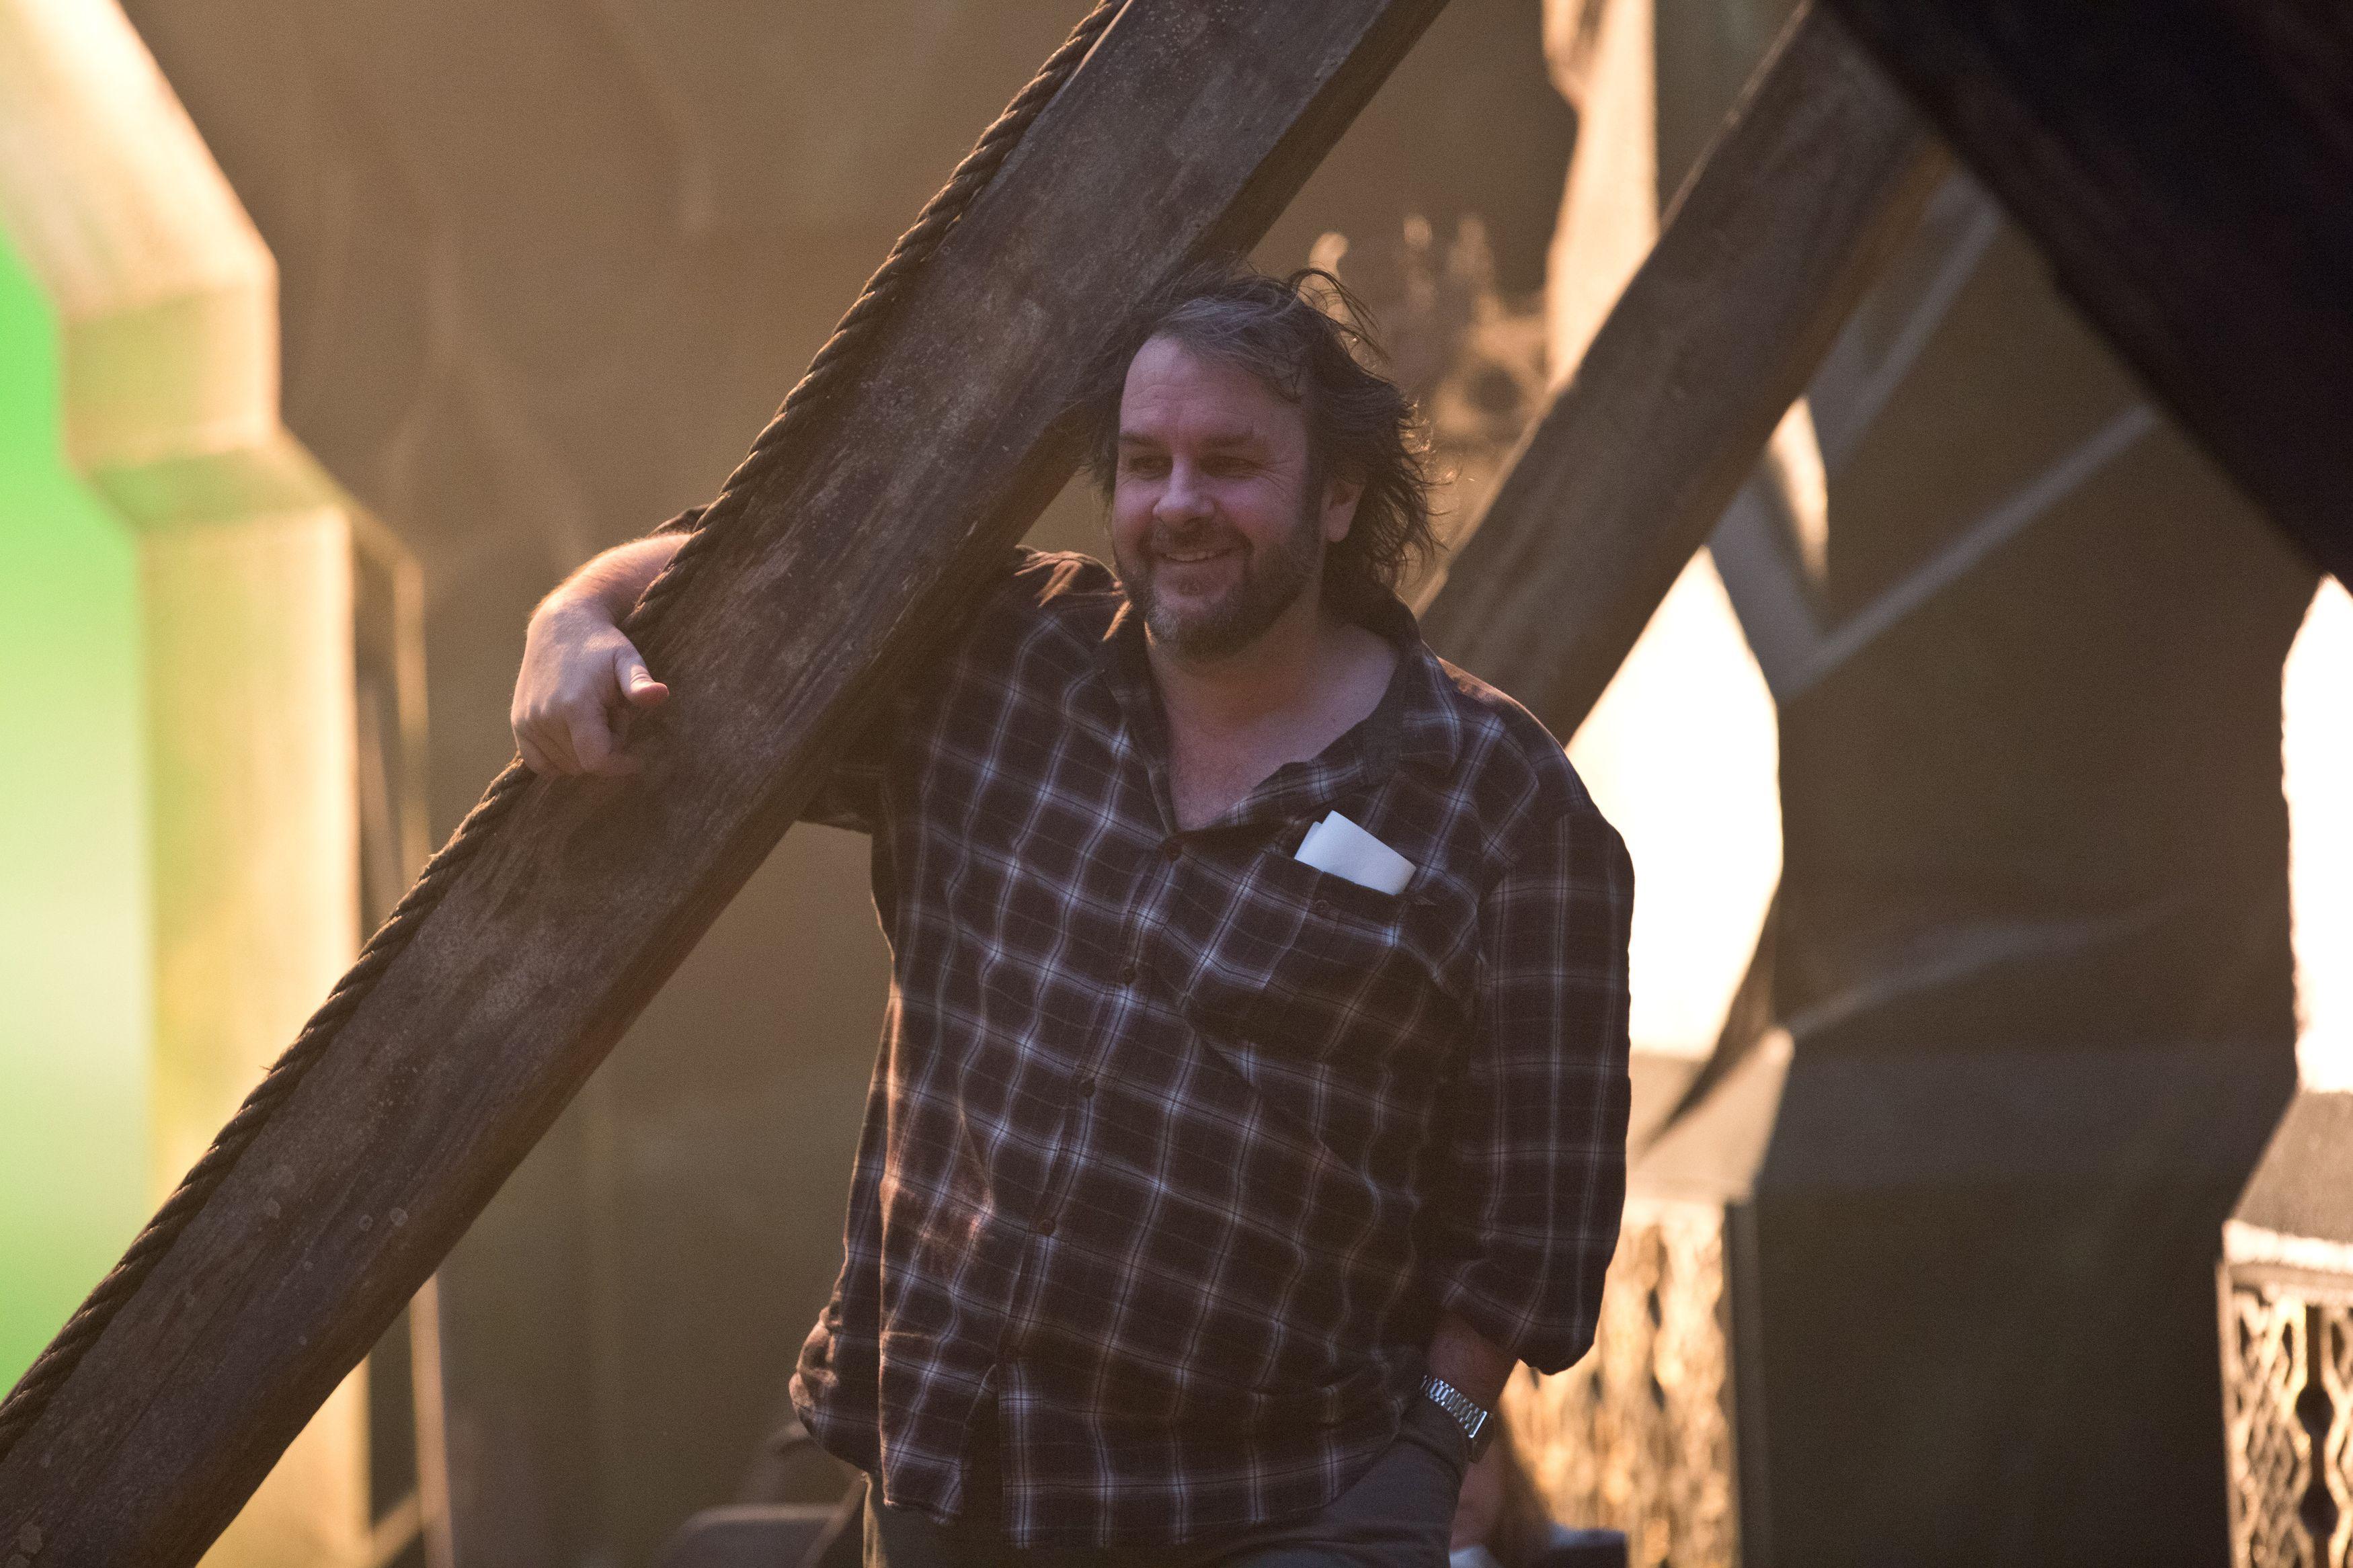 Peter Jackson to produce Hobbit films forecasting